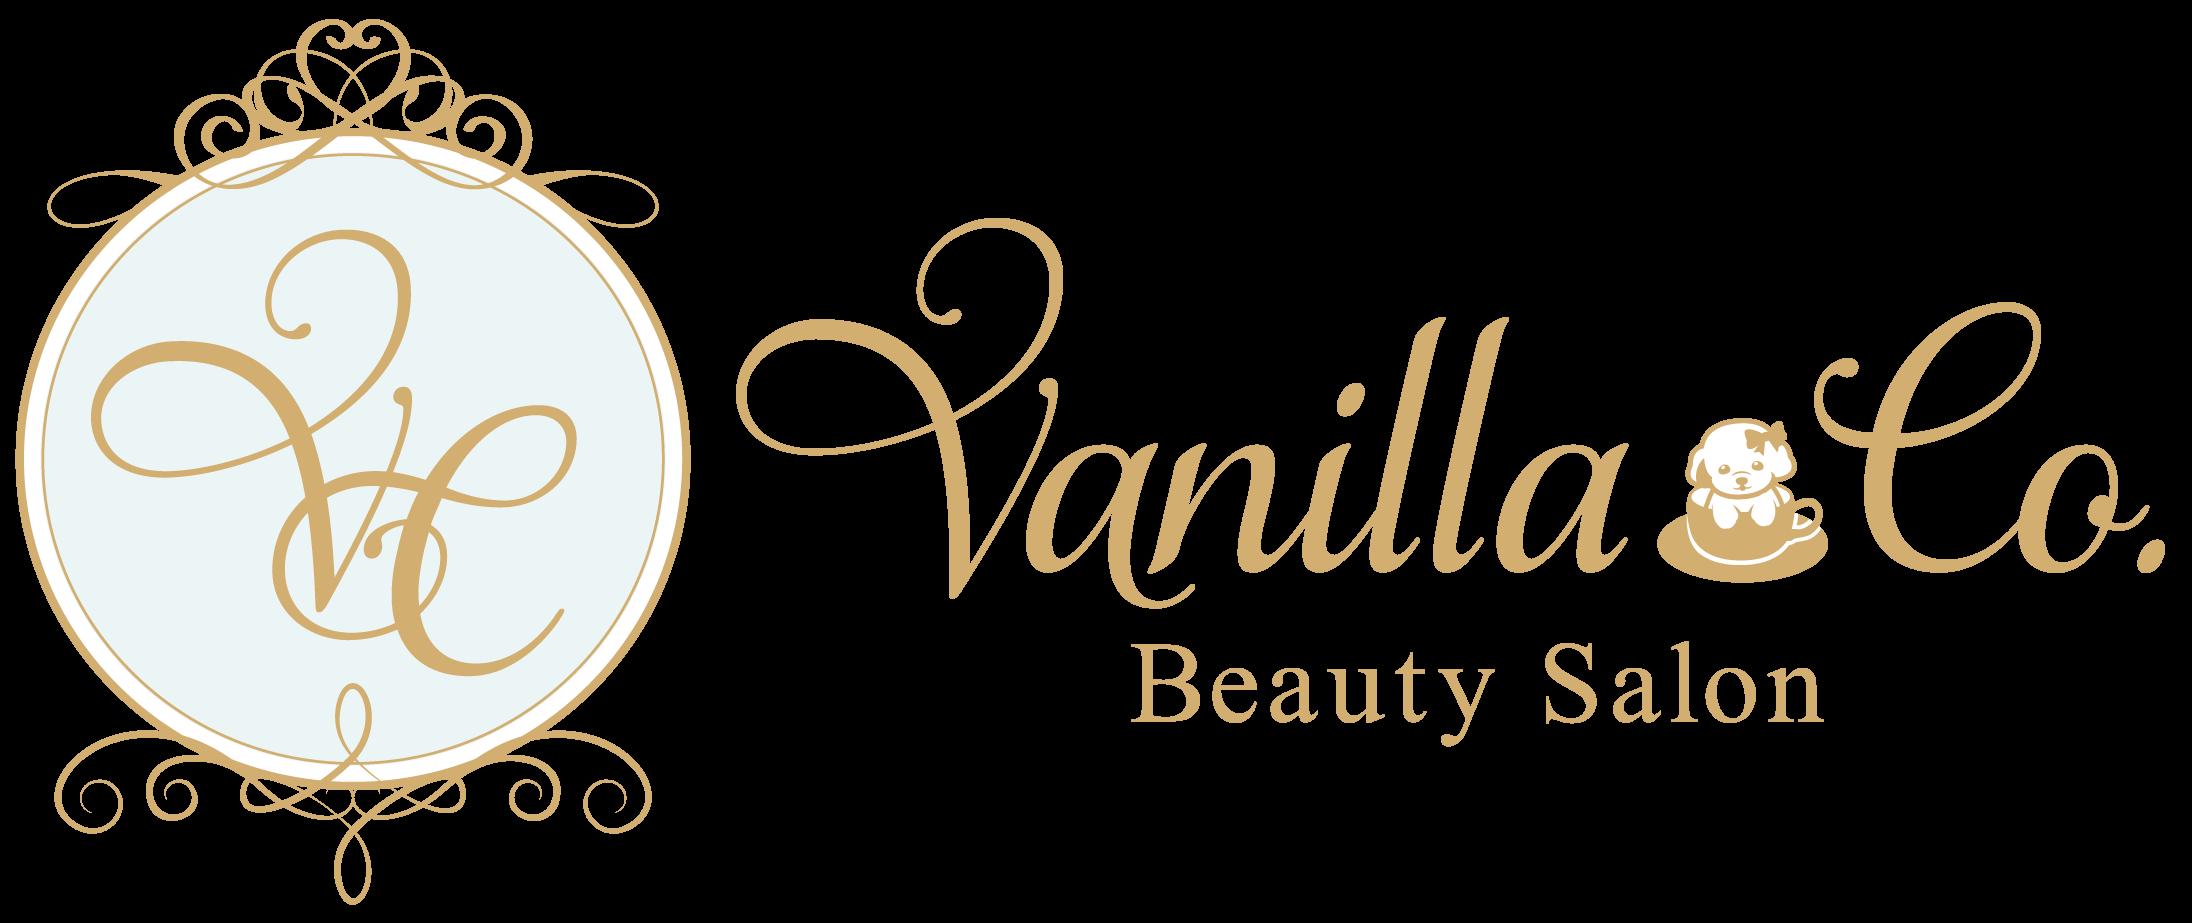 VanillaCo.